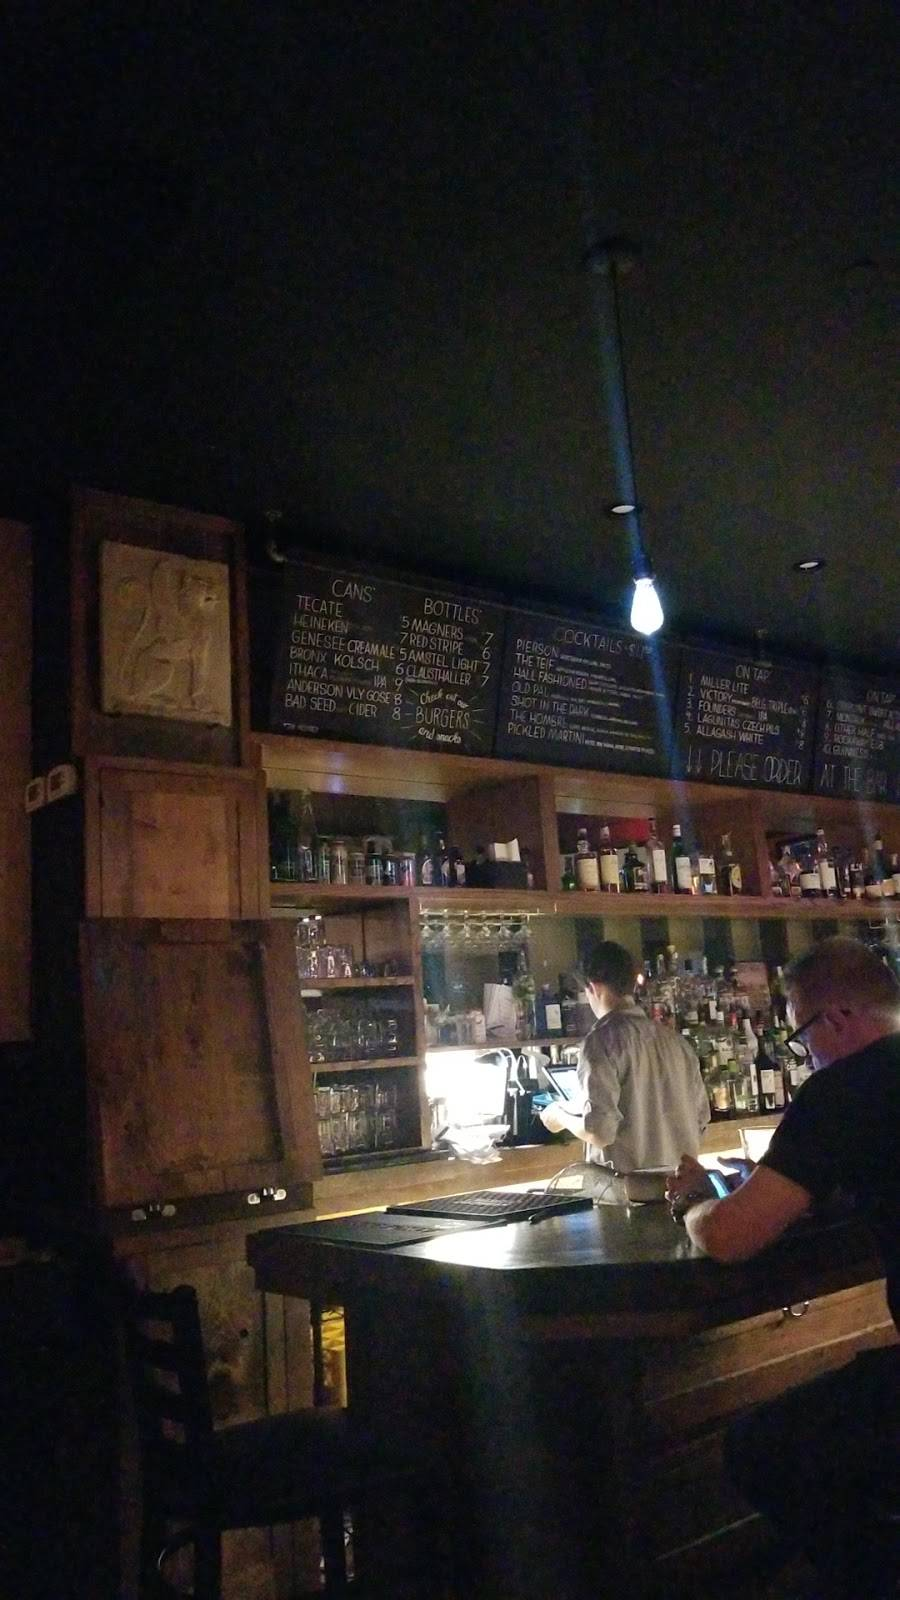 Sanger Hall | restaurant | 48-20 Skillman Ave, Long Island City, NY 11104, USA | 7184578130 OR +1 718-457-8130